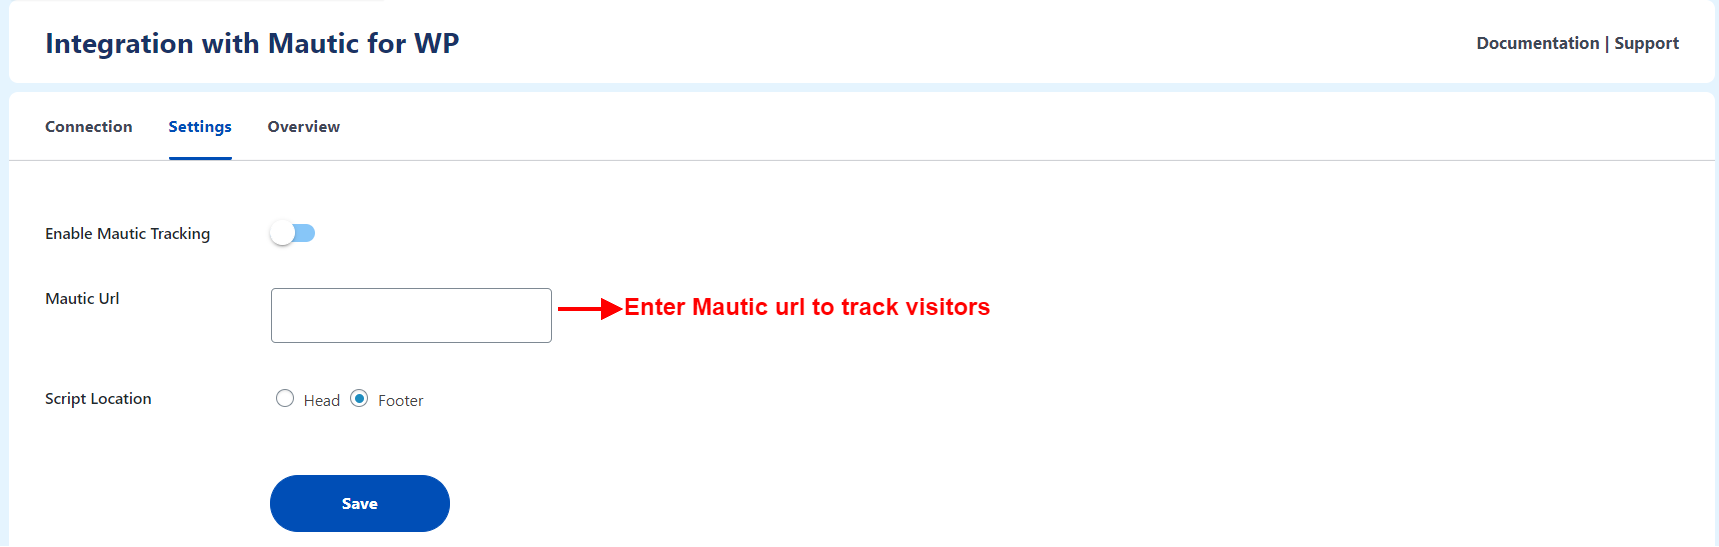 enable mautic tracking